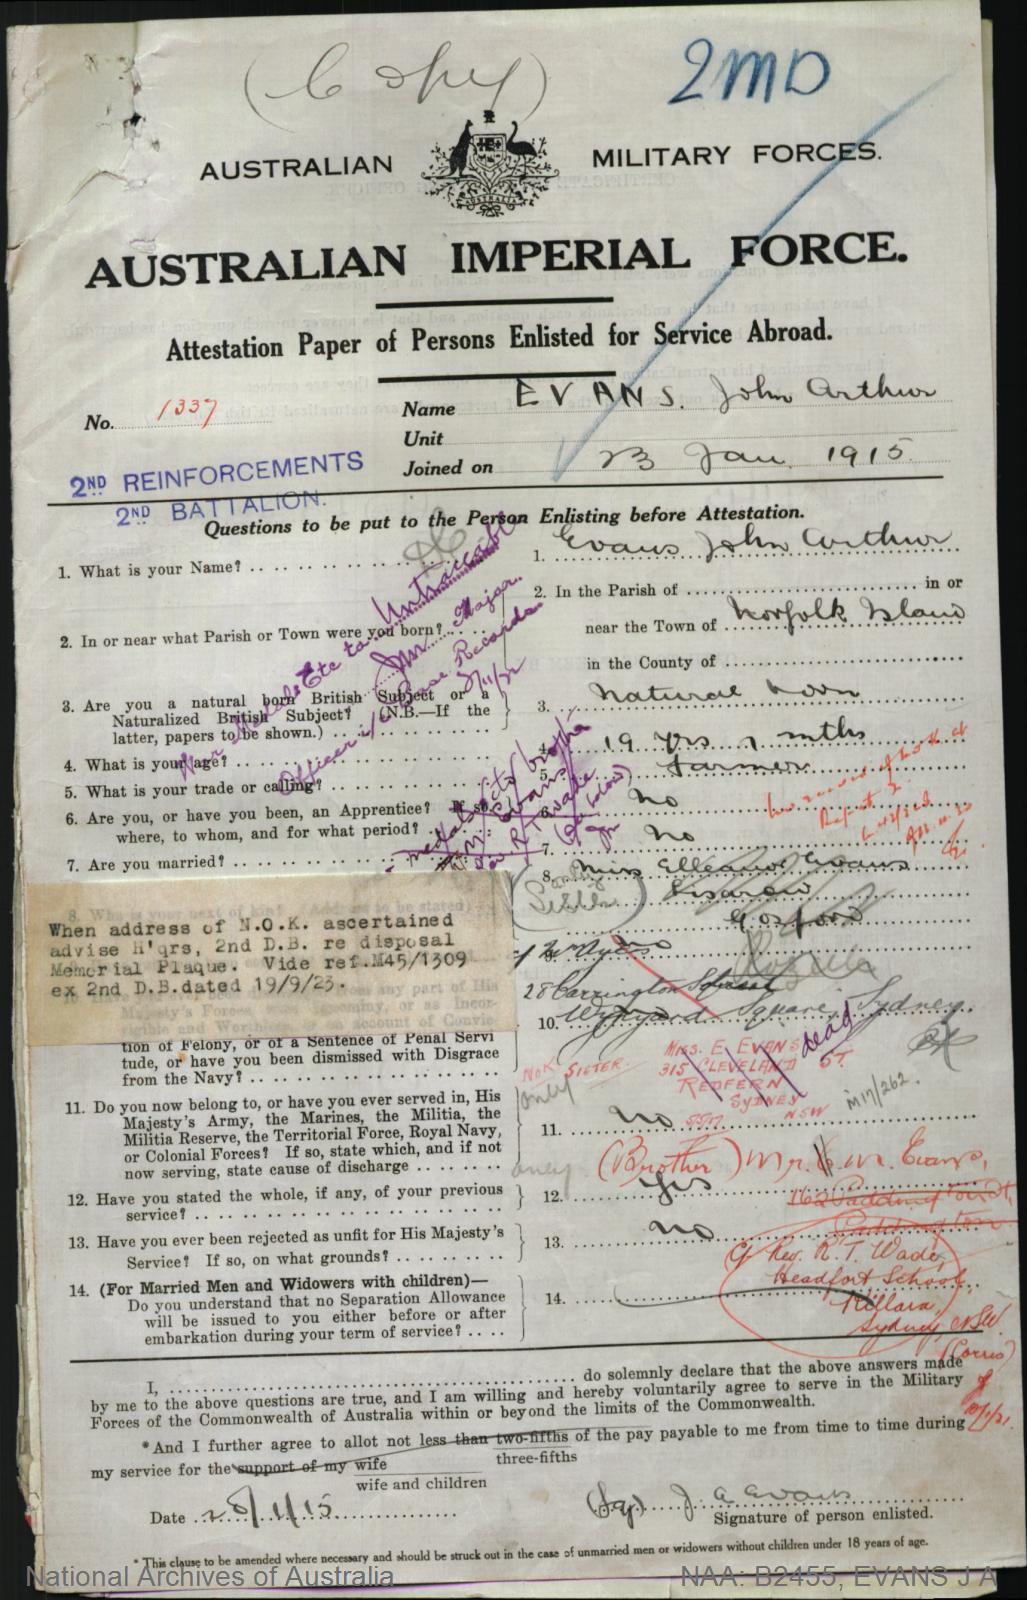 Evans John Arthur : SERN 1337 : POB Norfolk Island : POE Liverpool NSW : NOK S Evans Elleanor